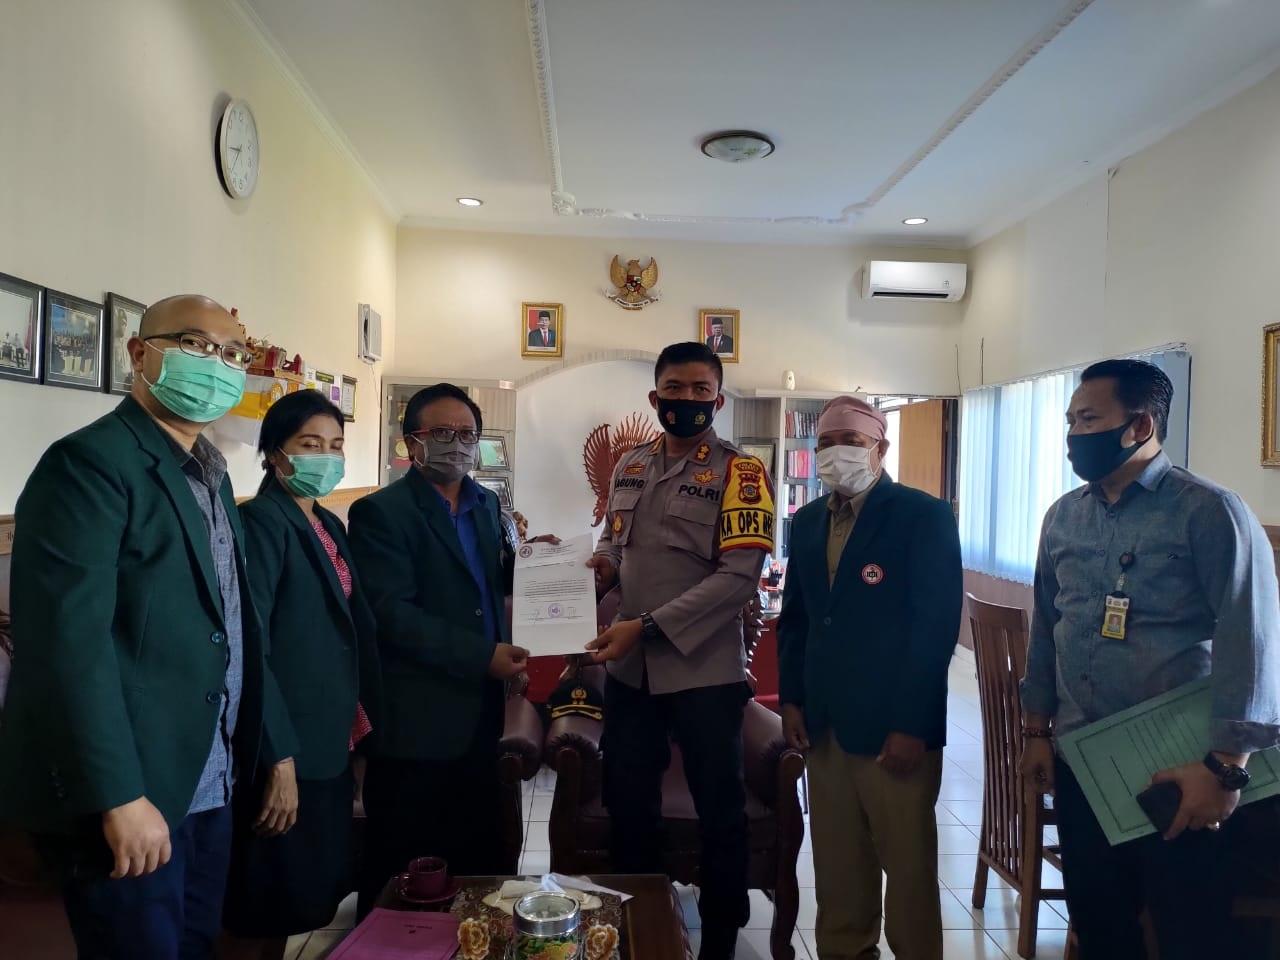 Foto: POLRES BANGLI PENYERAHAN surat dukungan Ketua IDI Cabang Bangli, dr. I Dewa Gede Oka Darsana kepada Kapolres Bangli, Senin (24/8). Foto: gia